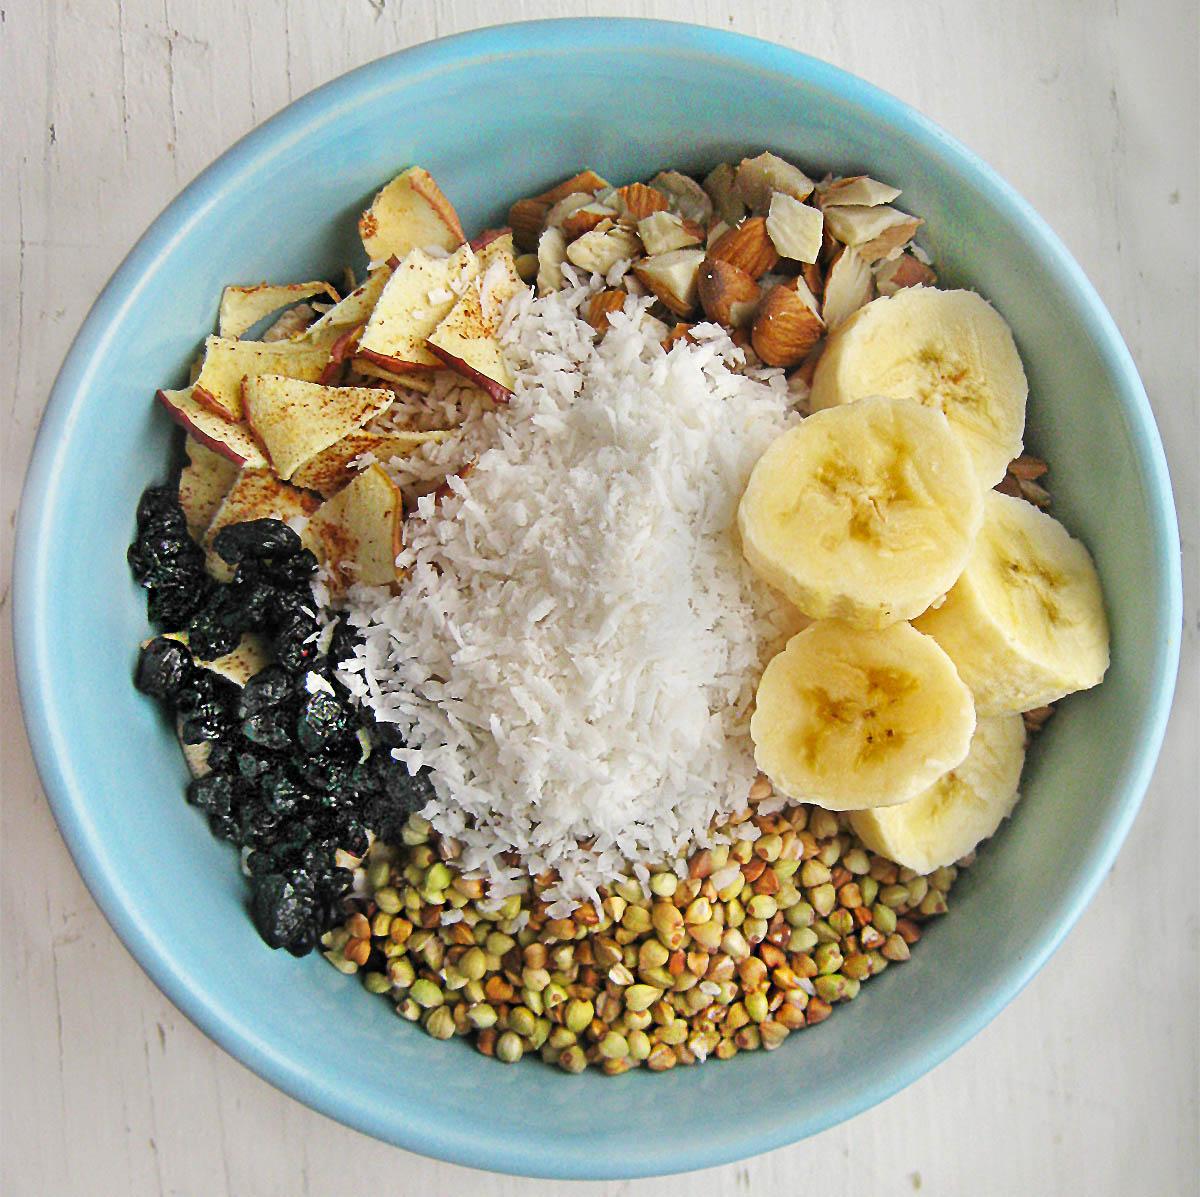 Gluten-Free Breakfast Cereal Bowl